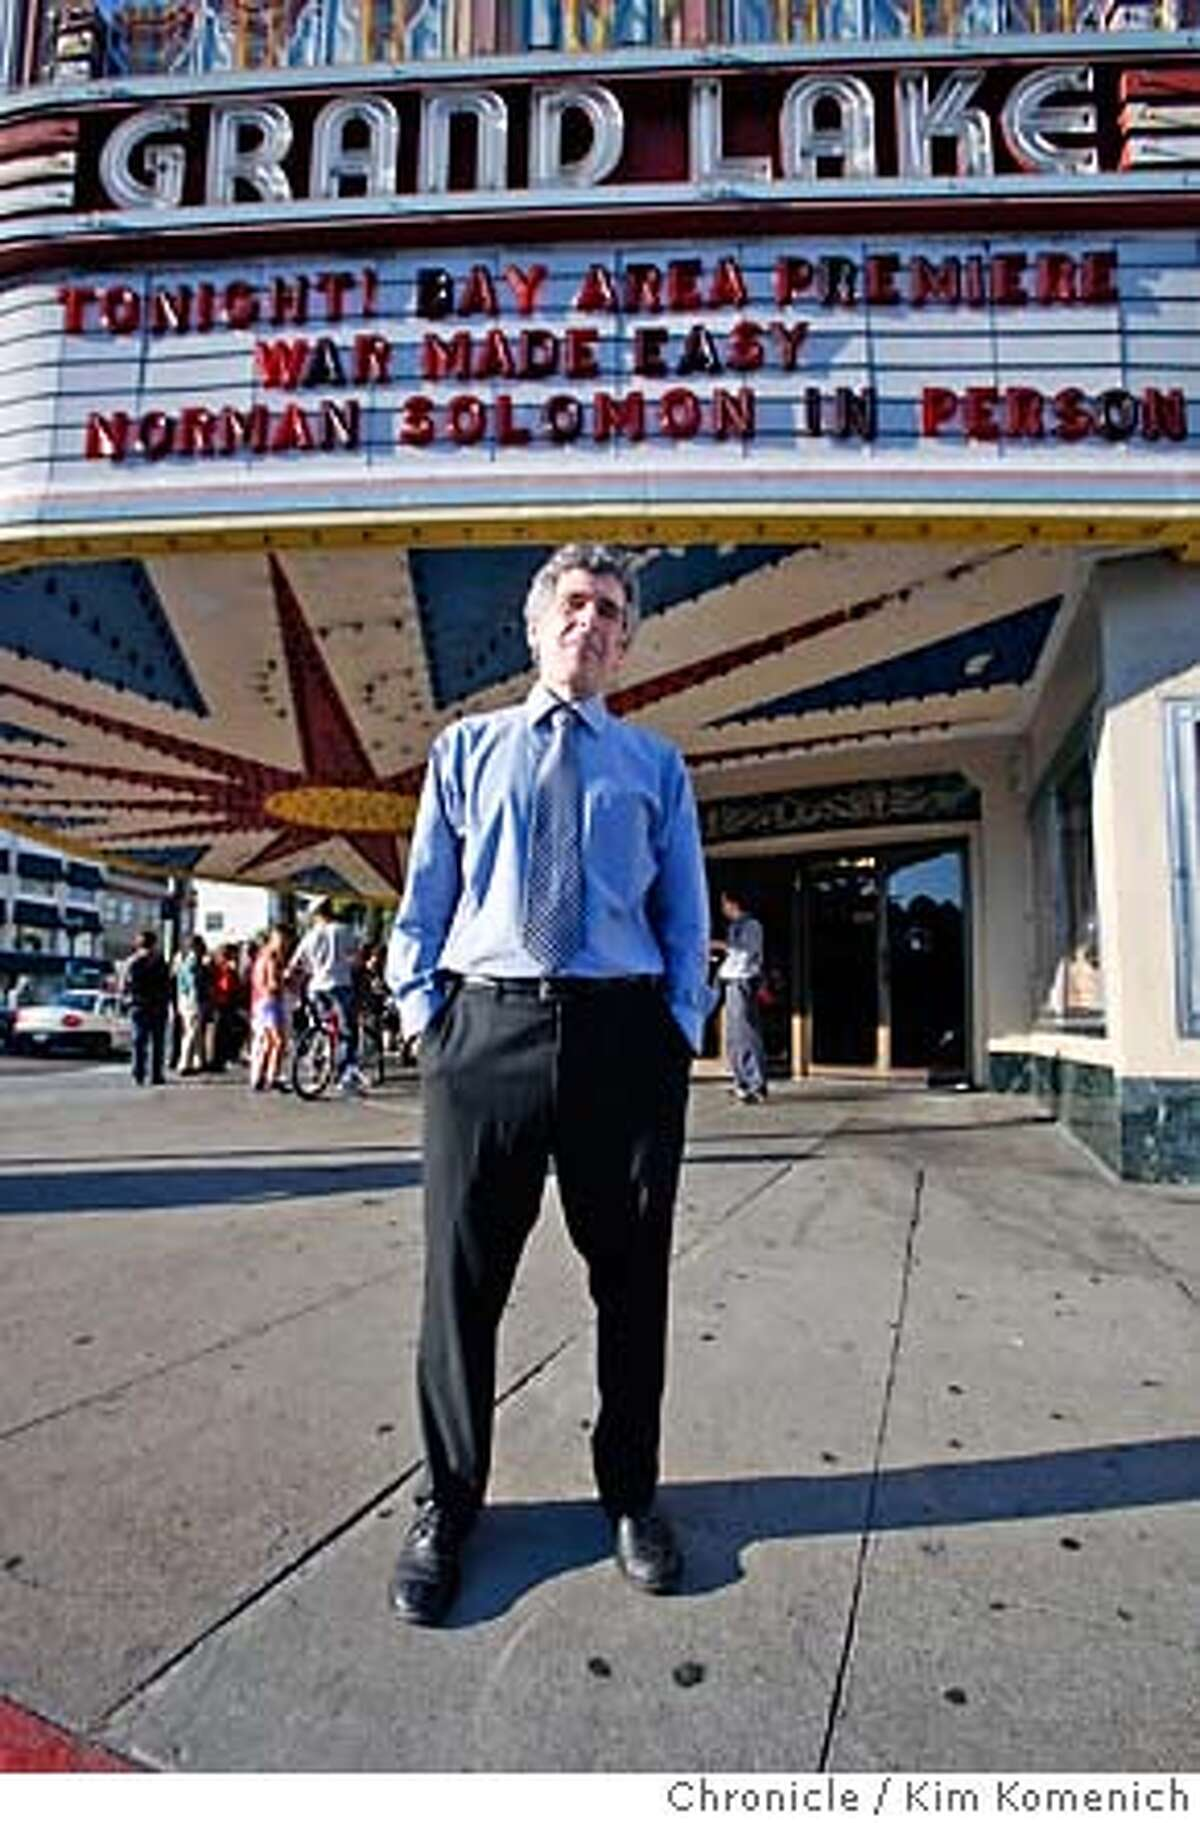 WAR19_075_KK.JPG Activist Norman Solomon greets moviegoers at the screening of his new film